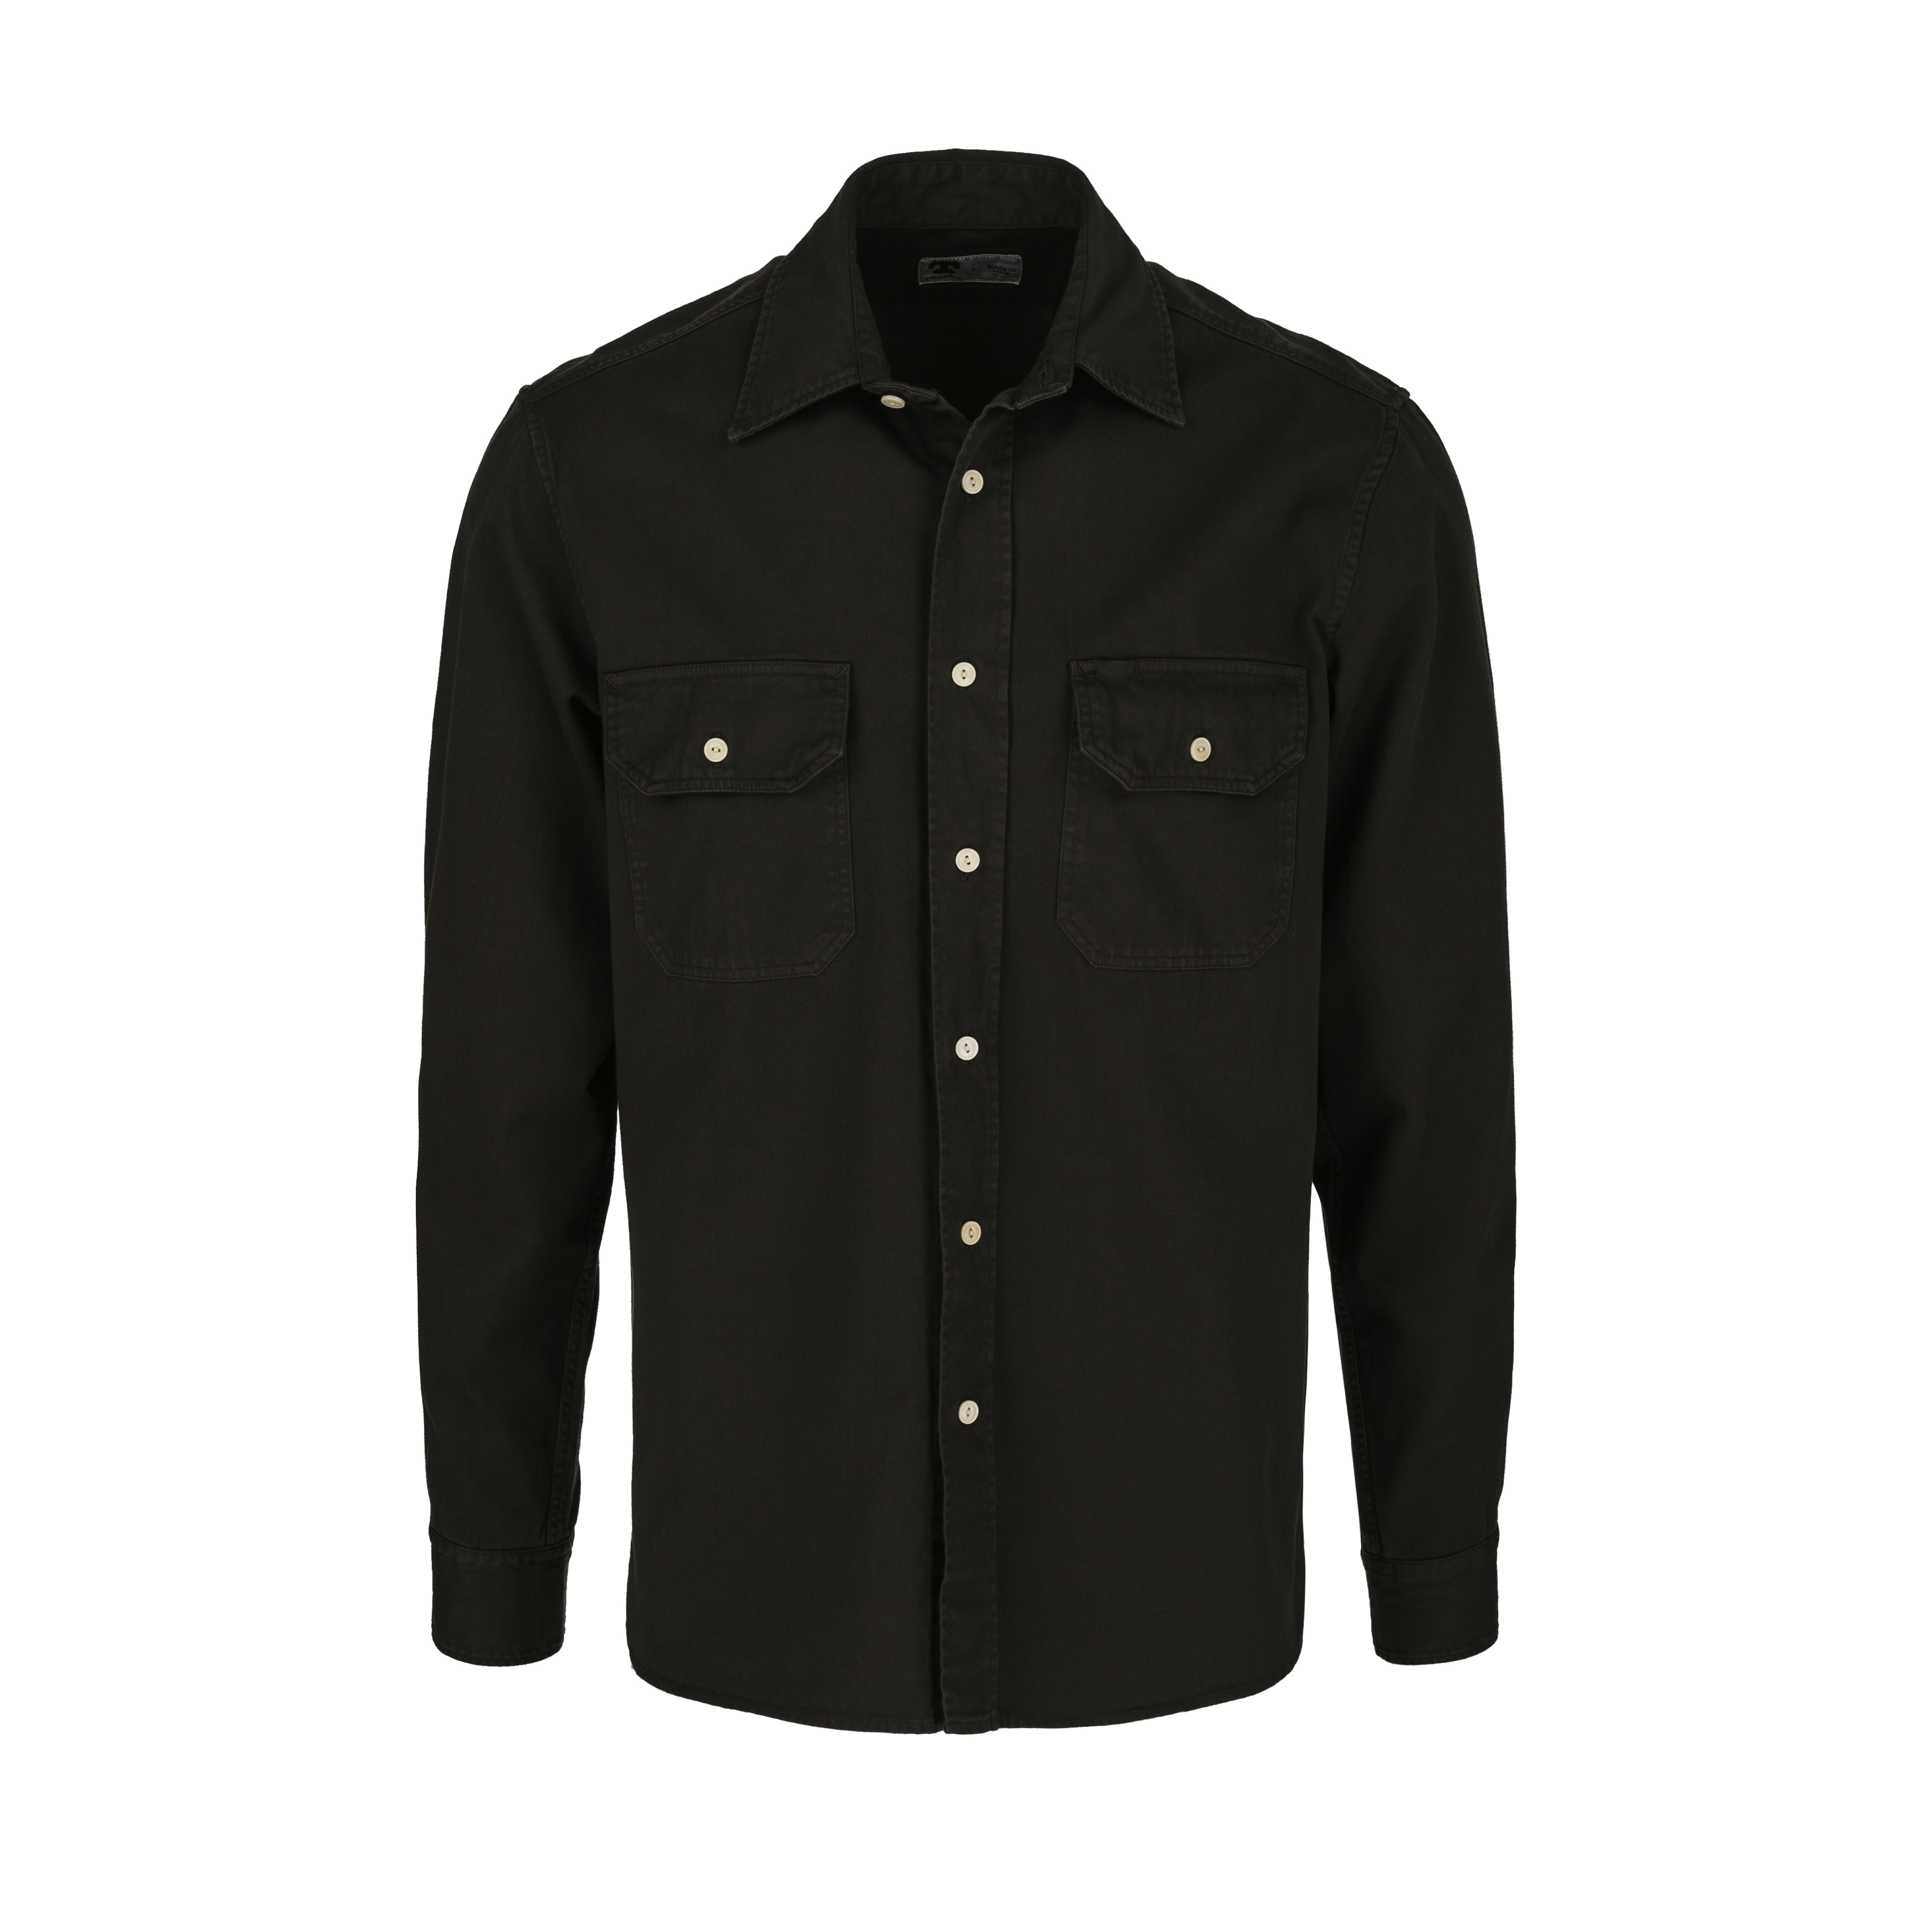 546b9a18bfc Tellason. Clampdown Twill Shirt Olive